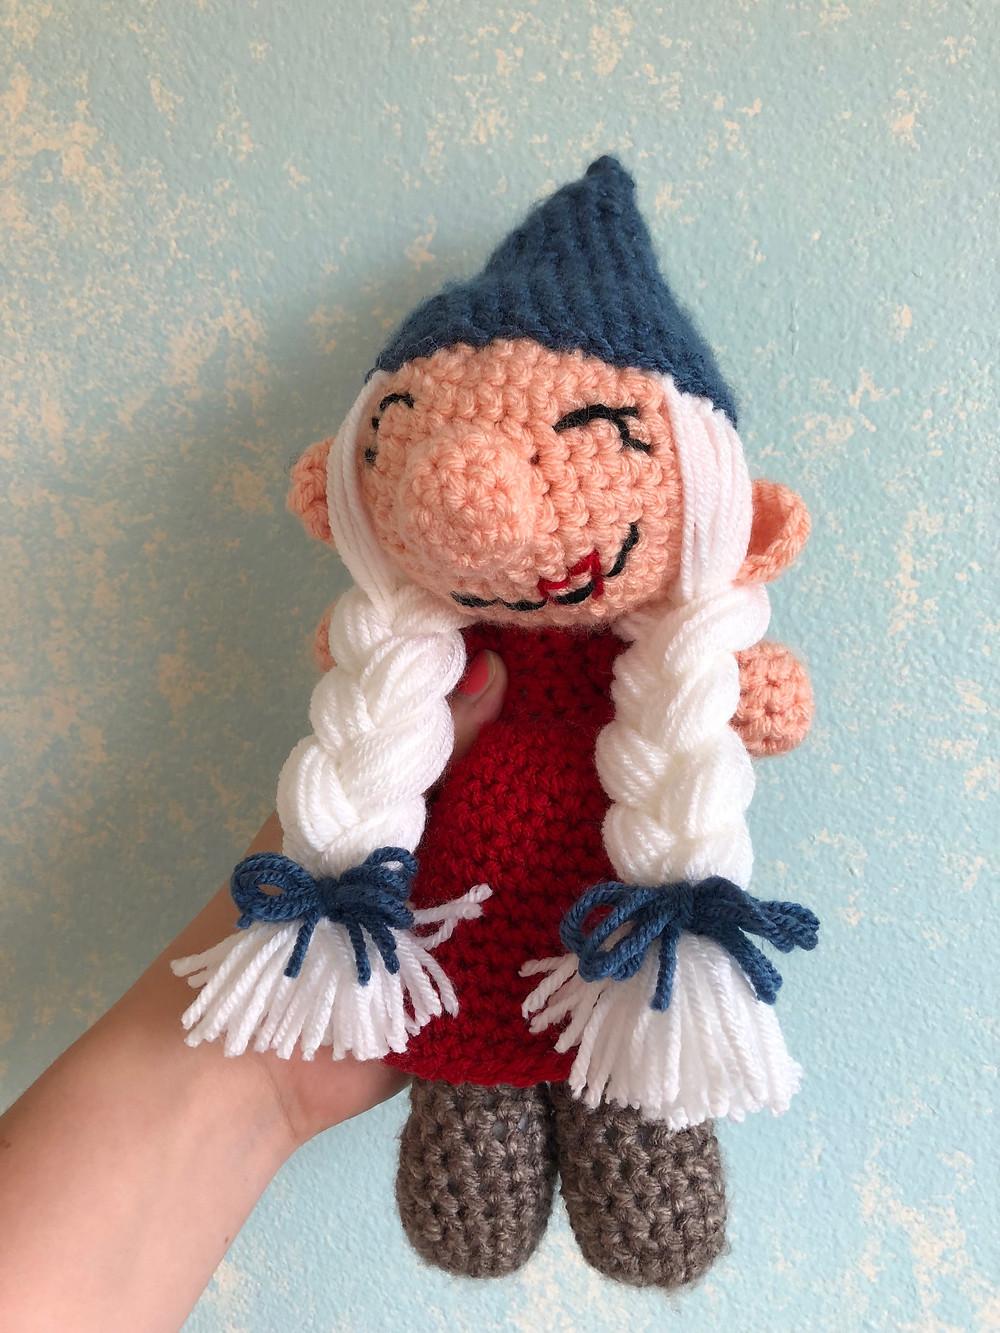 Kras the Gnome Crochet Pattern